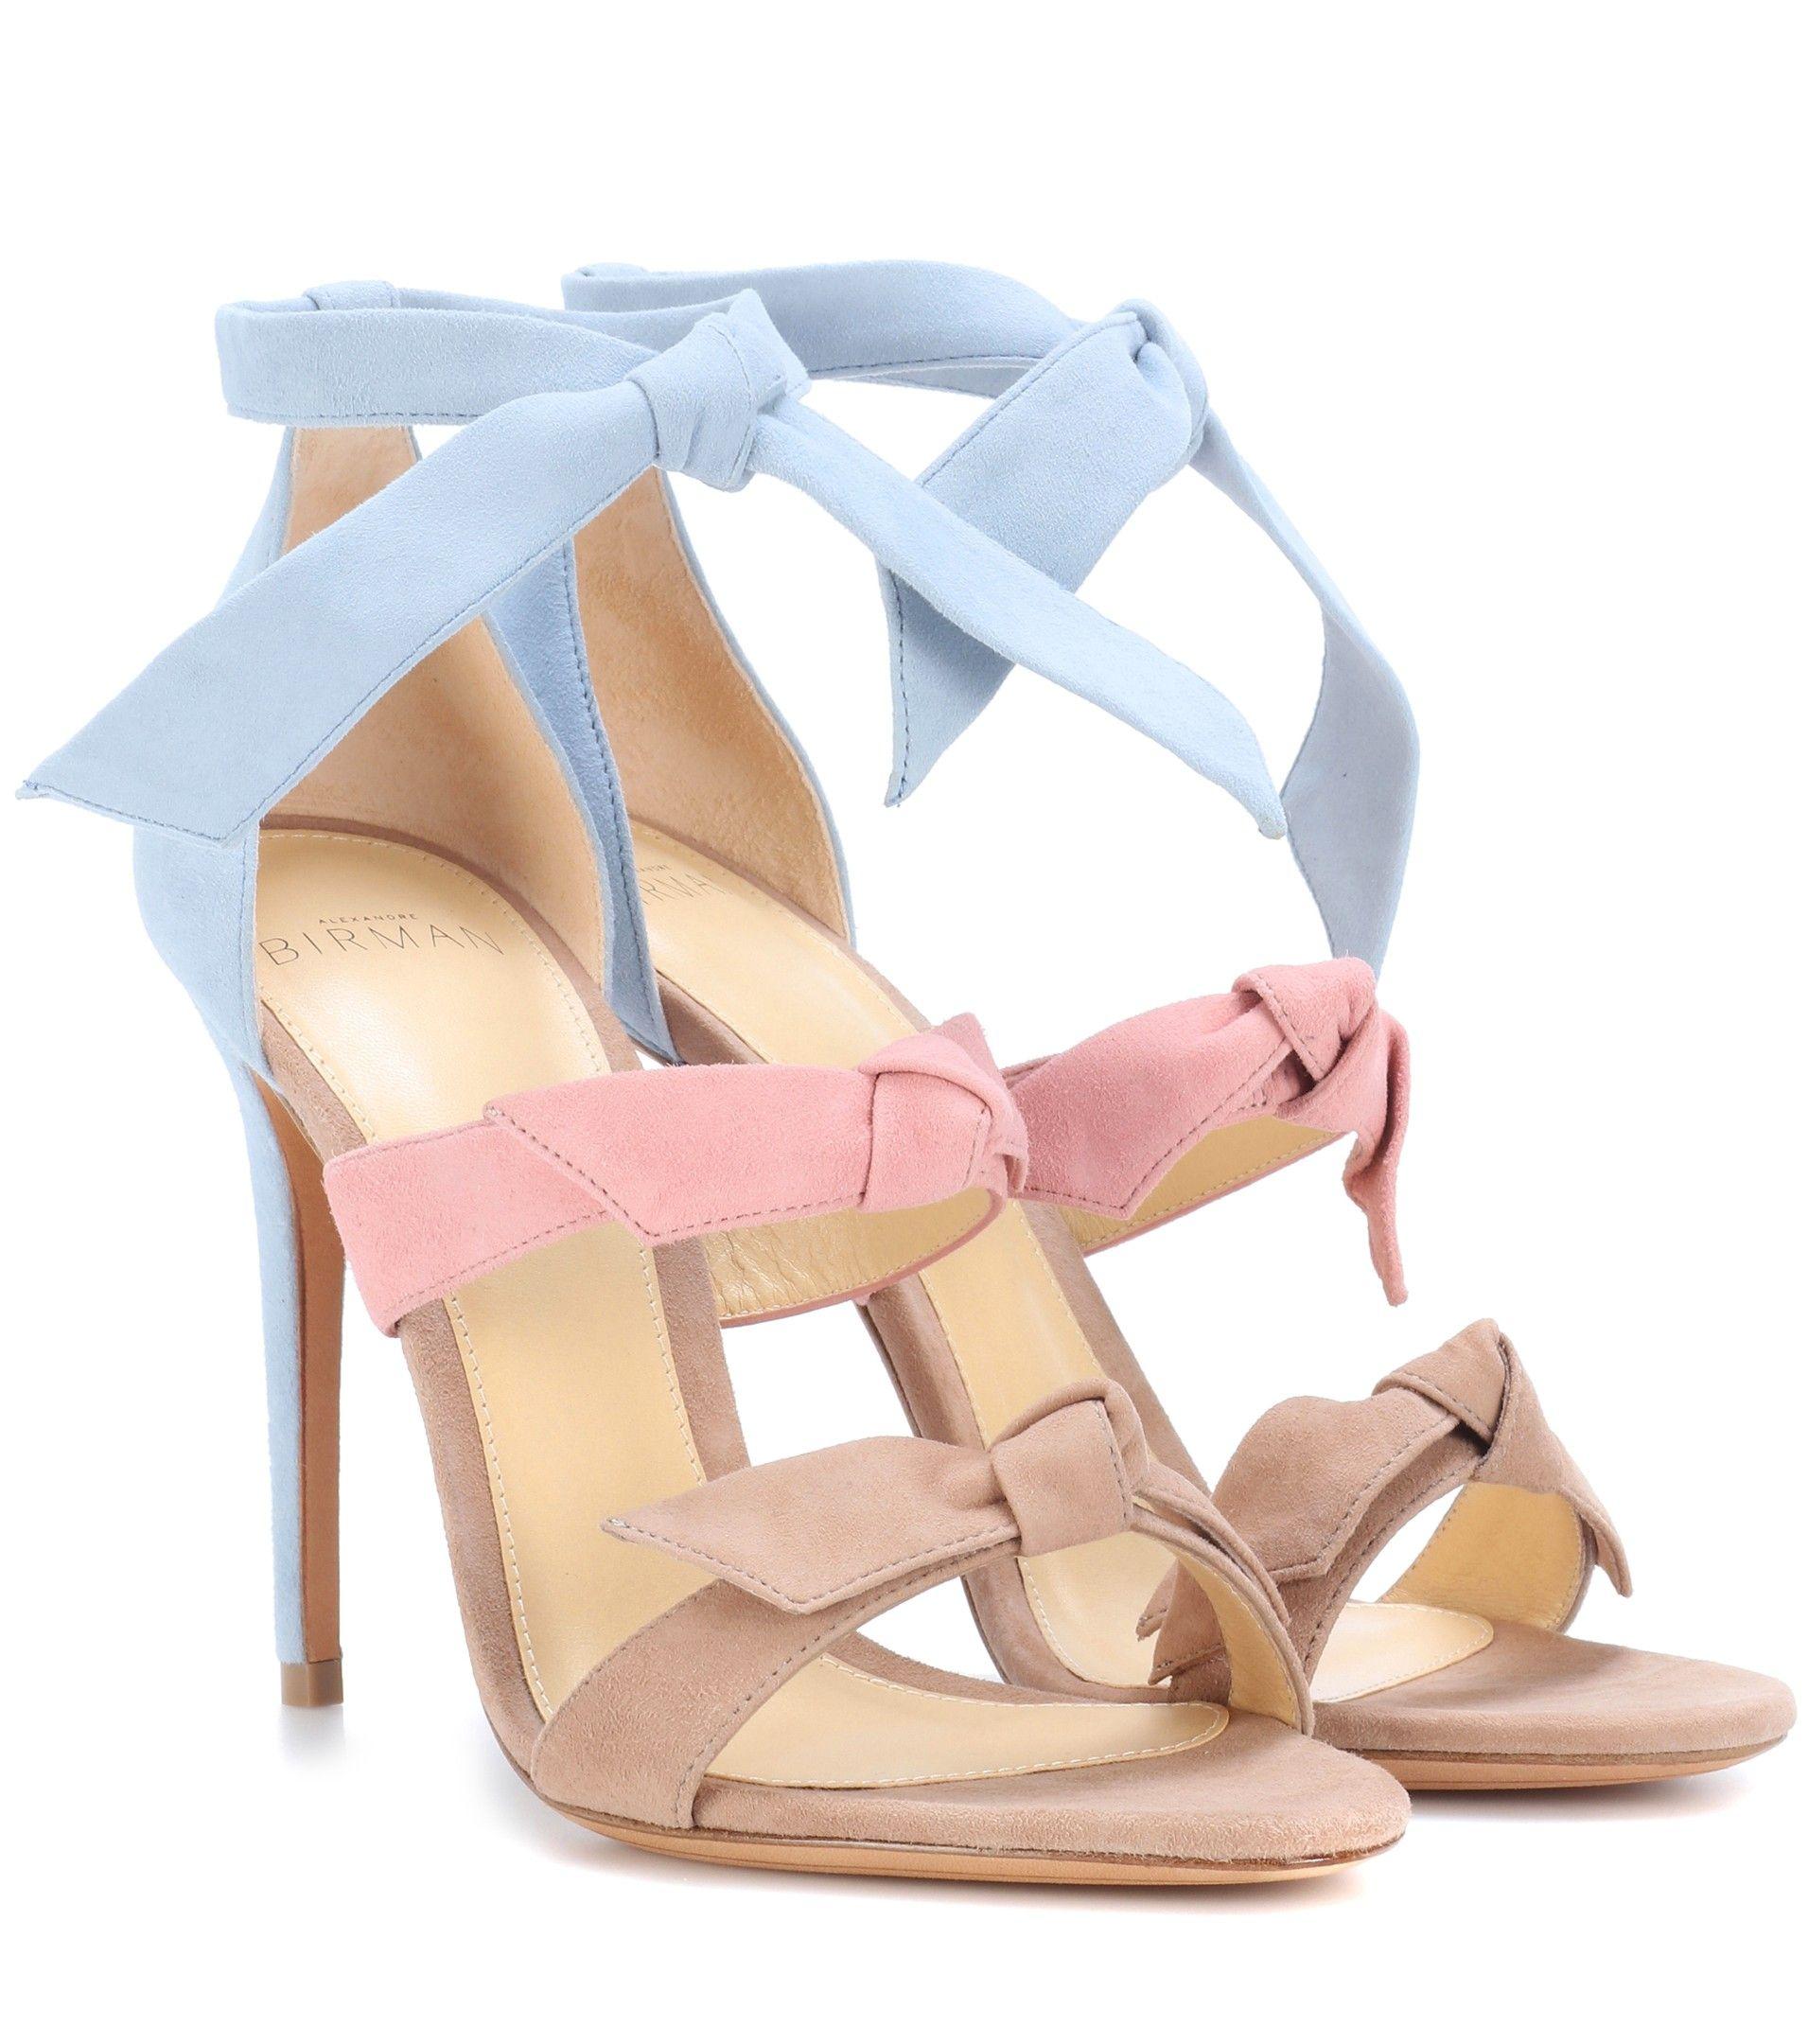 490d37c2c207 ALEXANDRE BIRMAN Lolita suede sandals